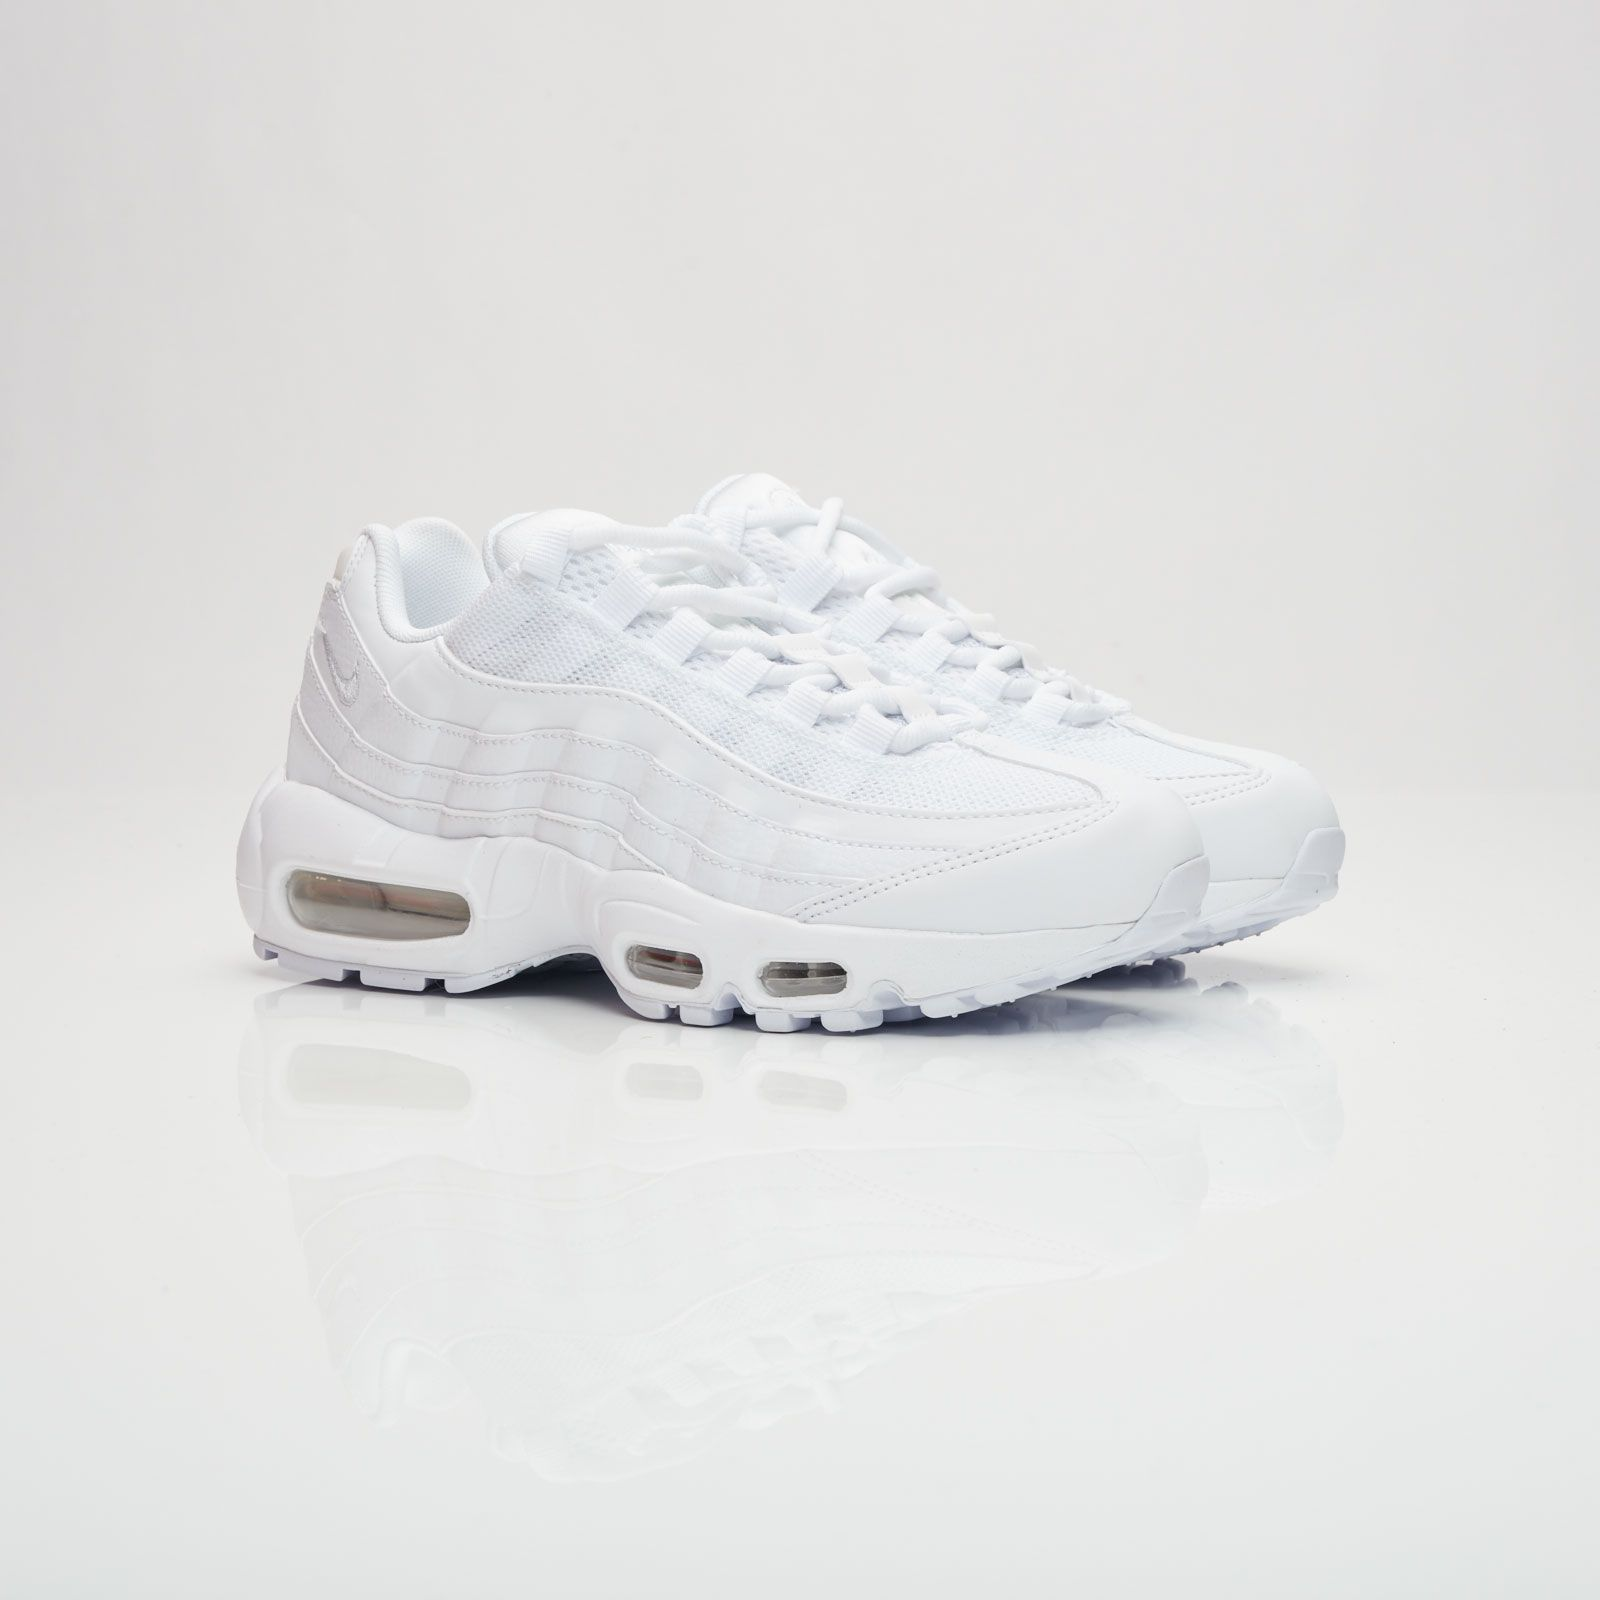 86f86249fb Nike Wmns Air Max 95 | Sneakers | Pinterest | Air max 95 and Air max